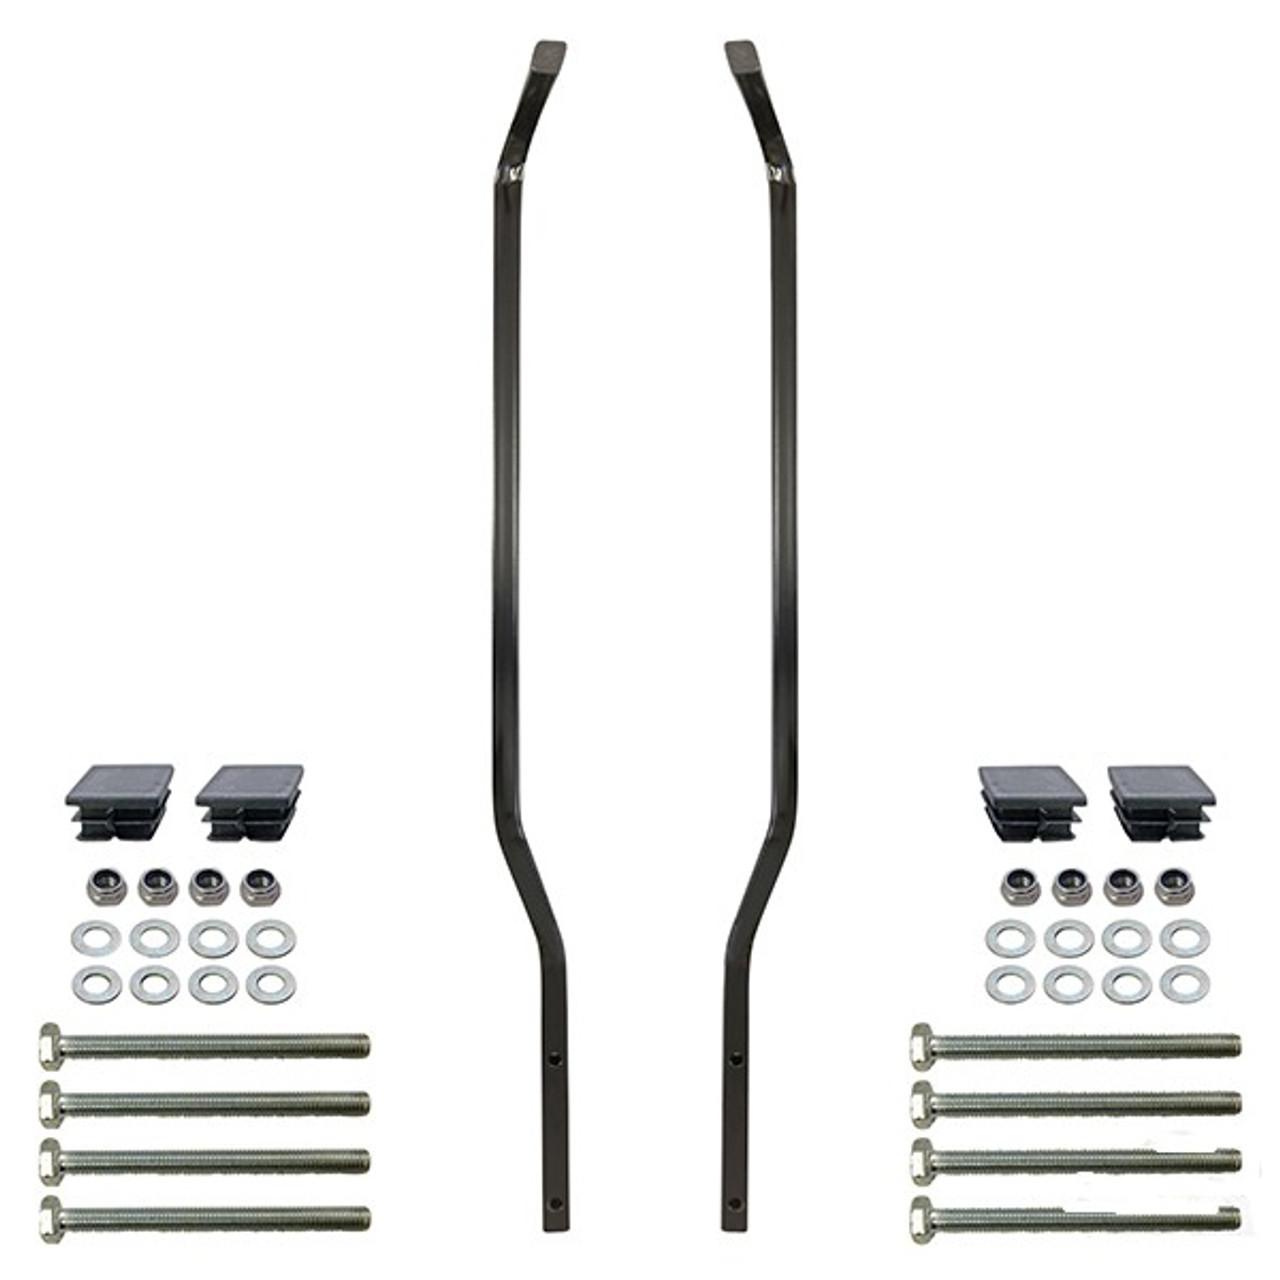 "RHOX Top Strut Kit, Carts w/ RHOX Seat & 88"" RHOX Top"